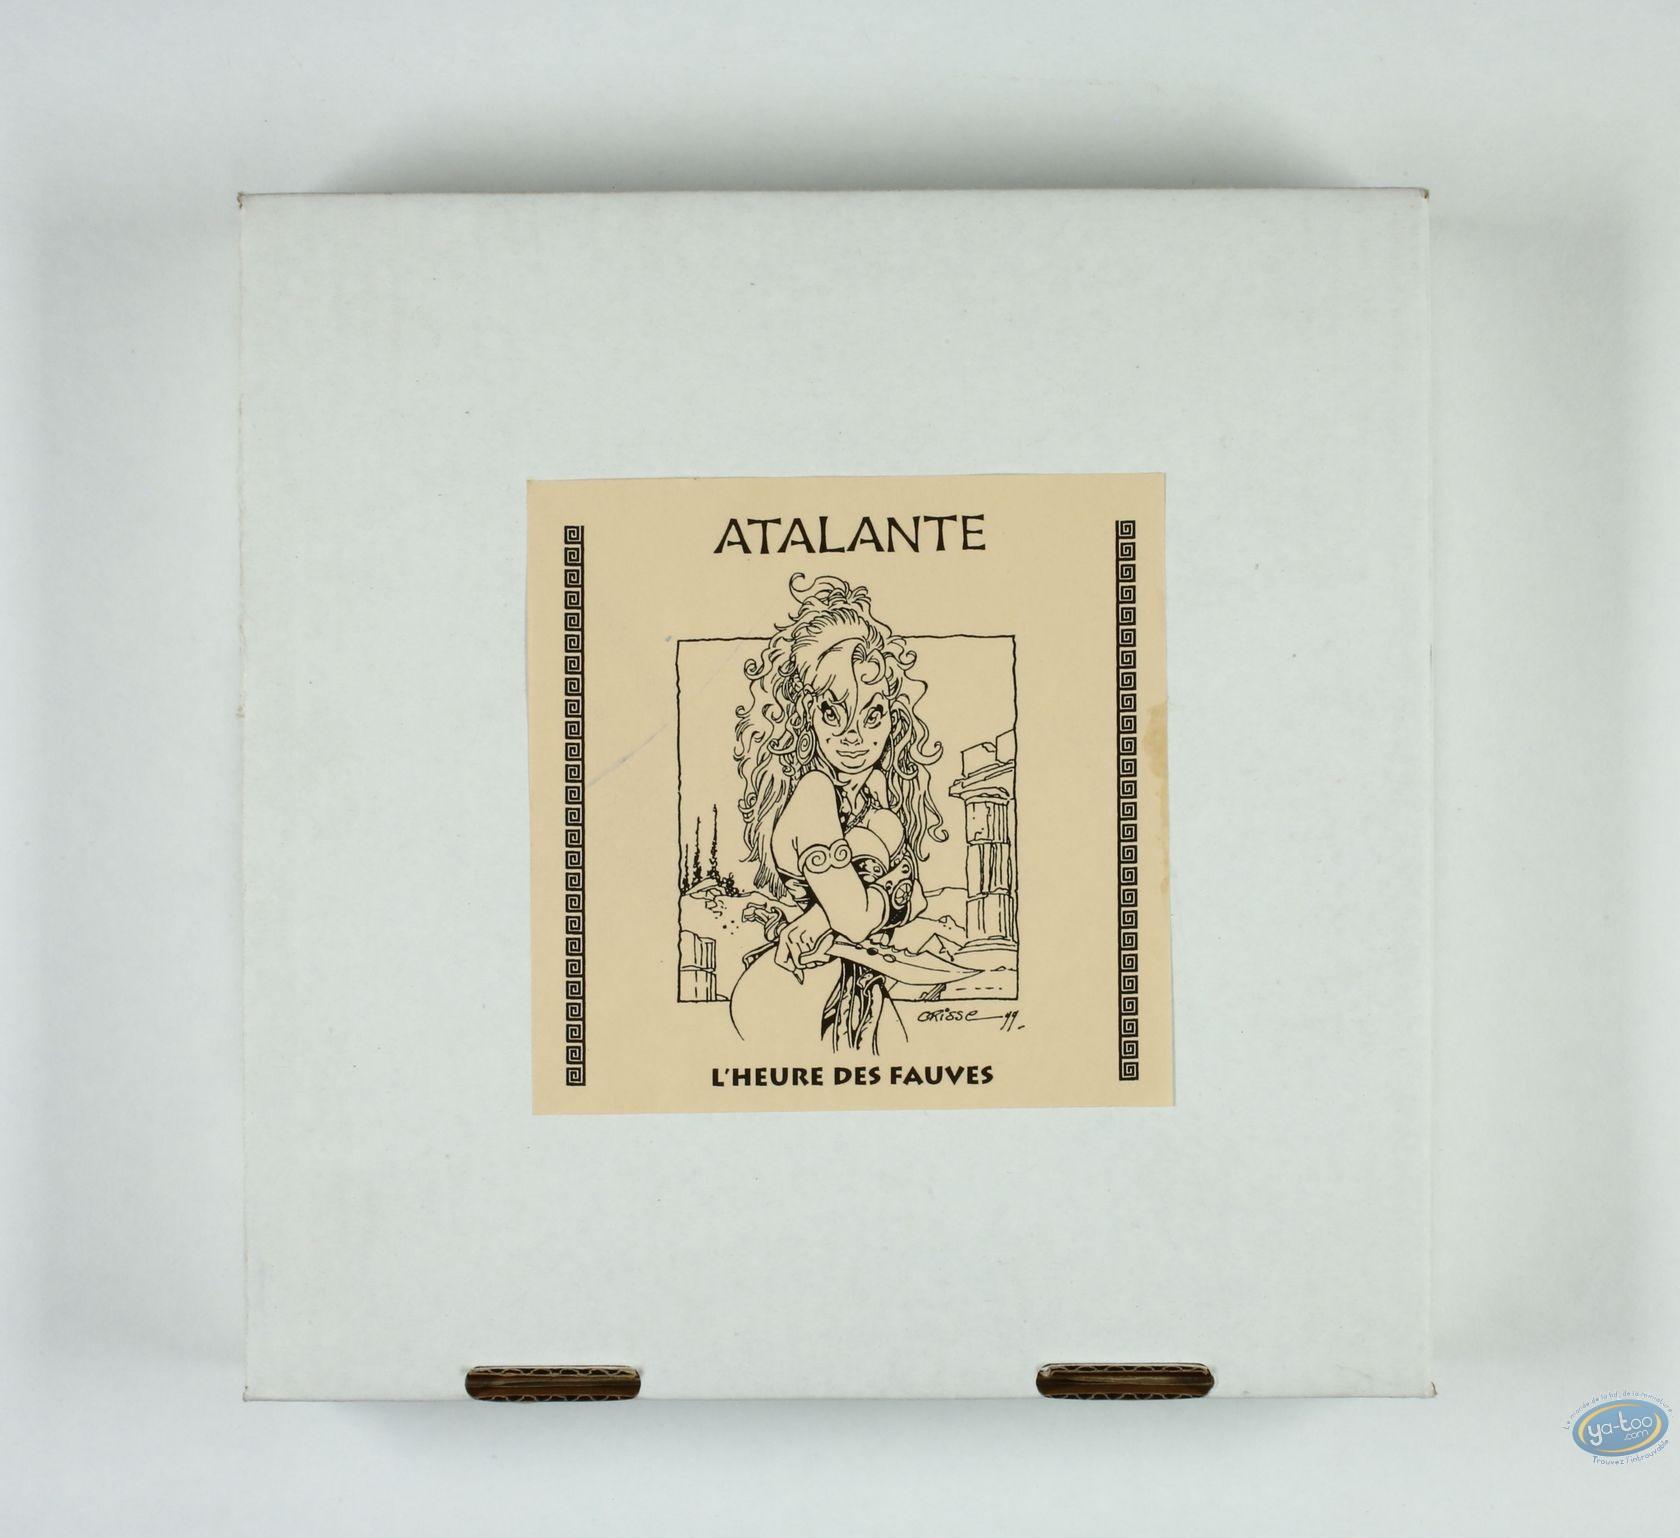 Horlogerie, Atalante : Horloge, Atalante, L'heure des fauves